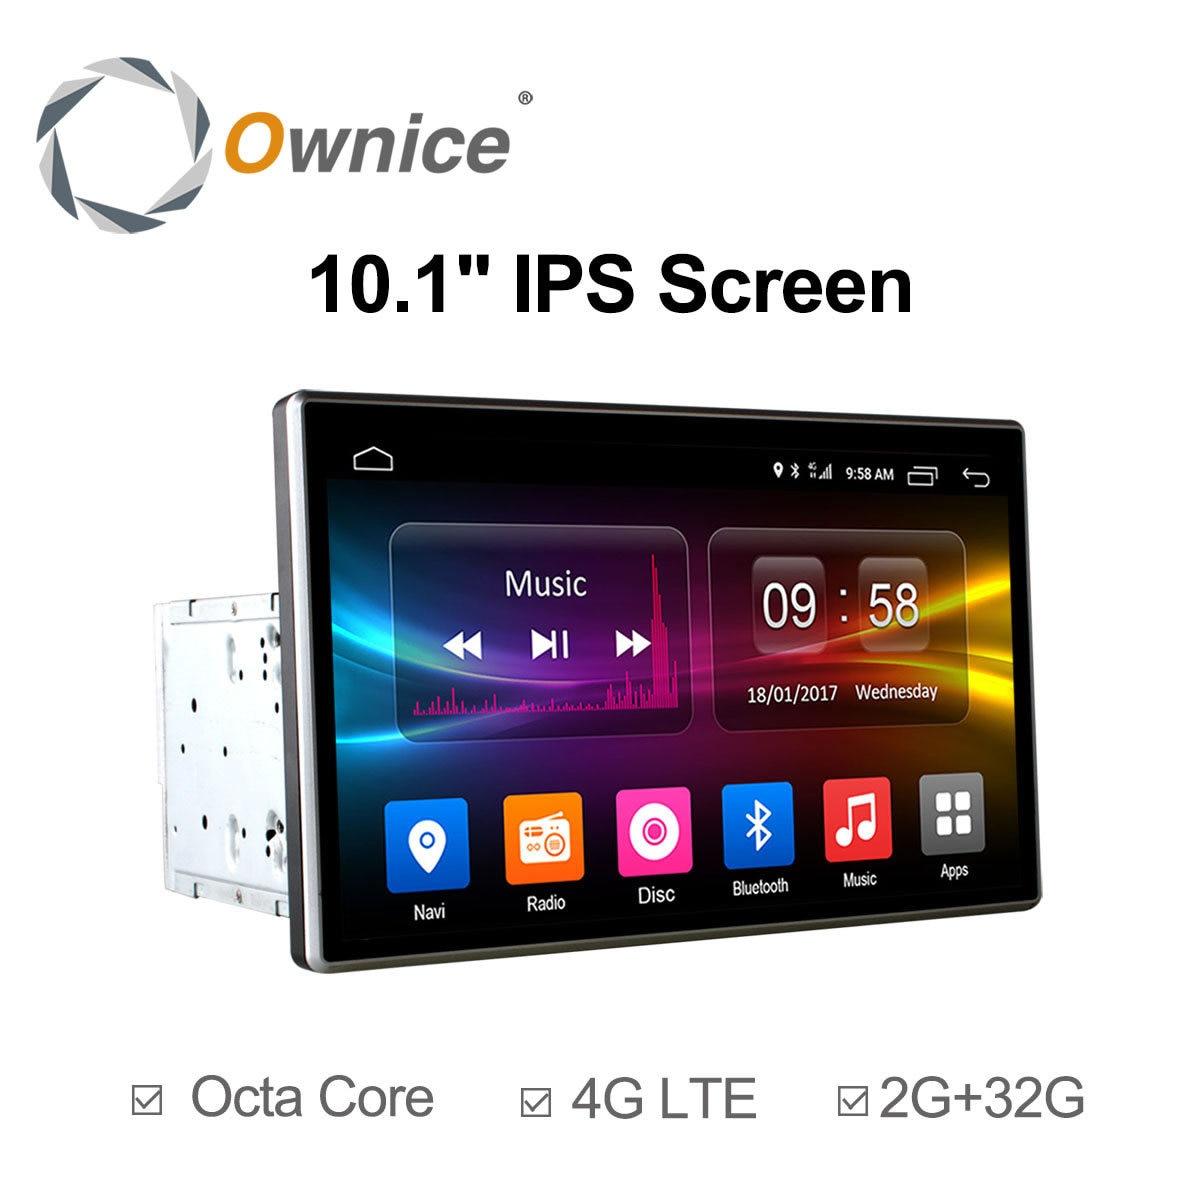 Ownice C500 2Din 10.1 pouce HD android 6.0 octa core Universel de voiture radio stéréo Lecteur DVD GPS Navigation TPMS DAB 4g LTE Carplay